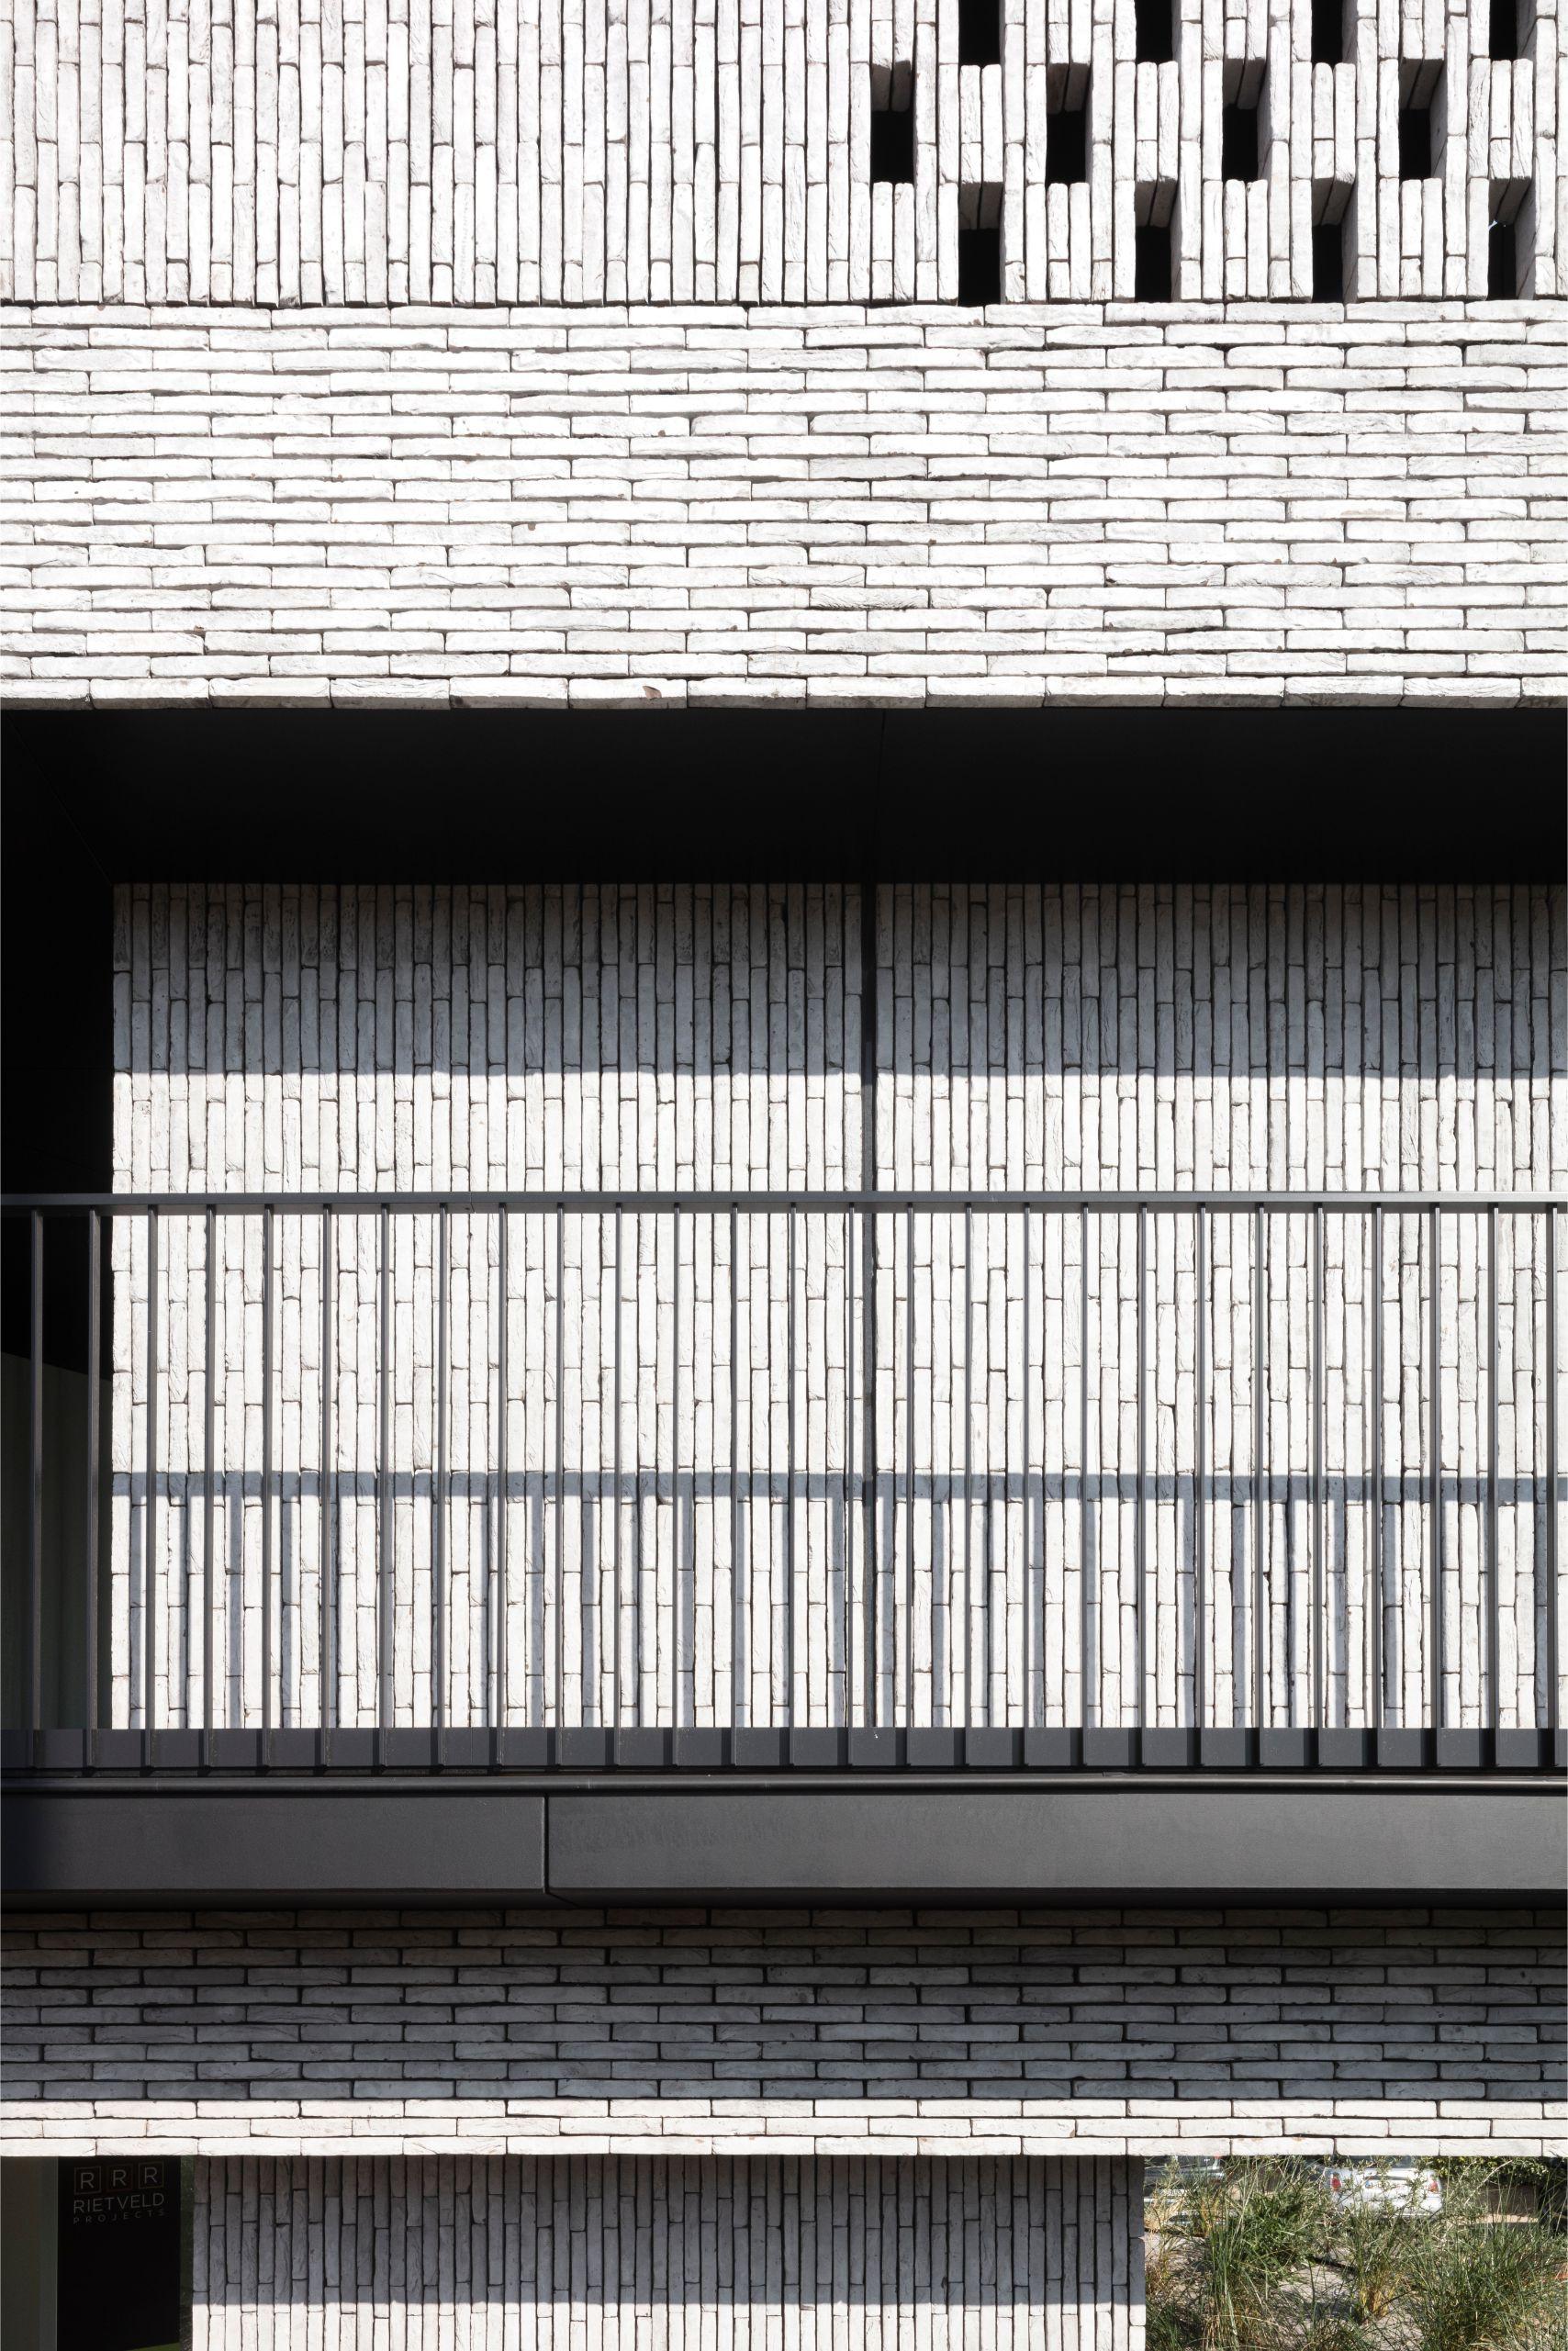 Pierre Paulin - Rietveldprojects - Sint-Idesbald - Tvdv7